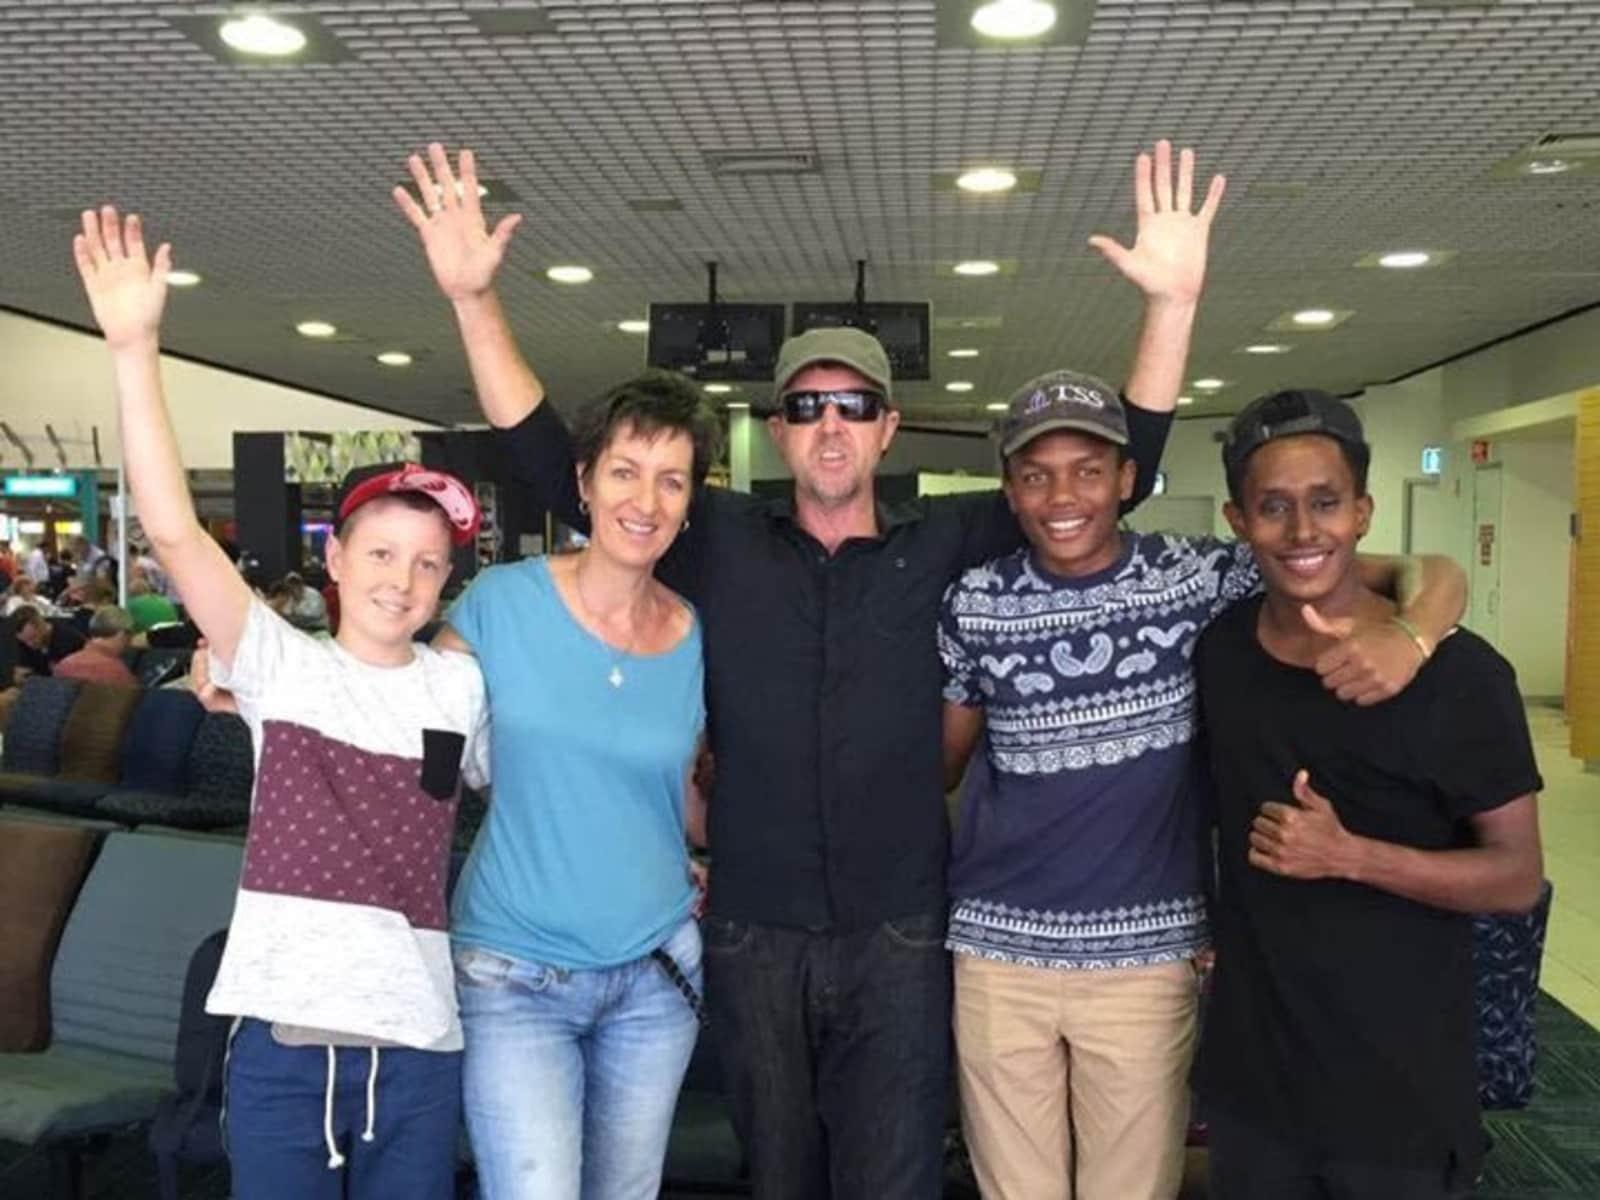 Michelle & Noel from Townsville, Queensland, Australia